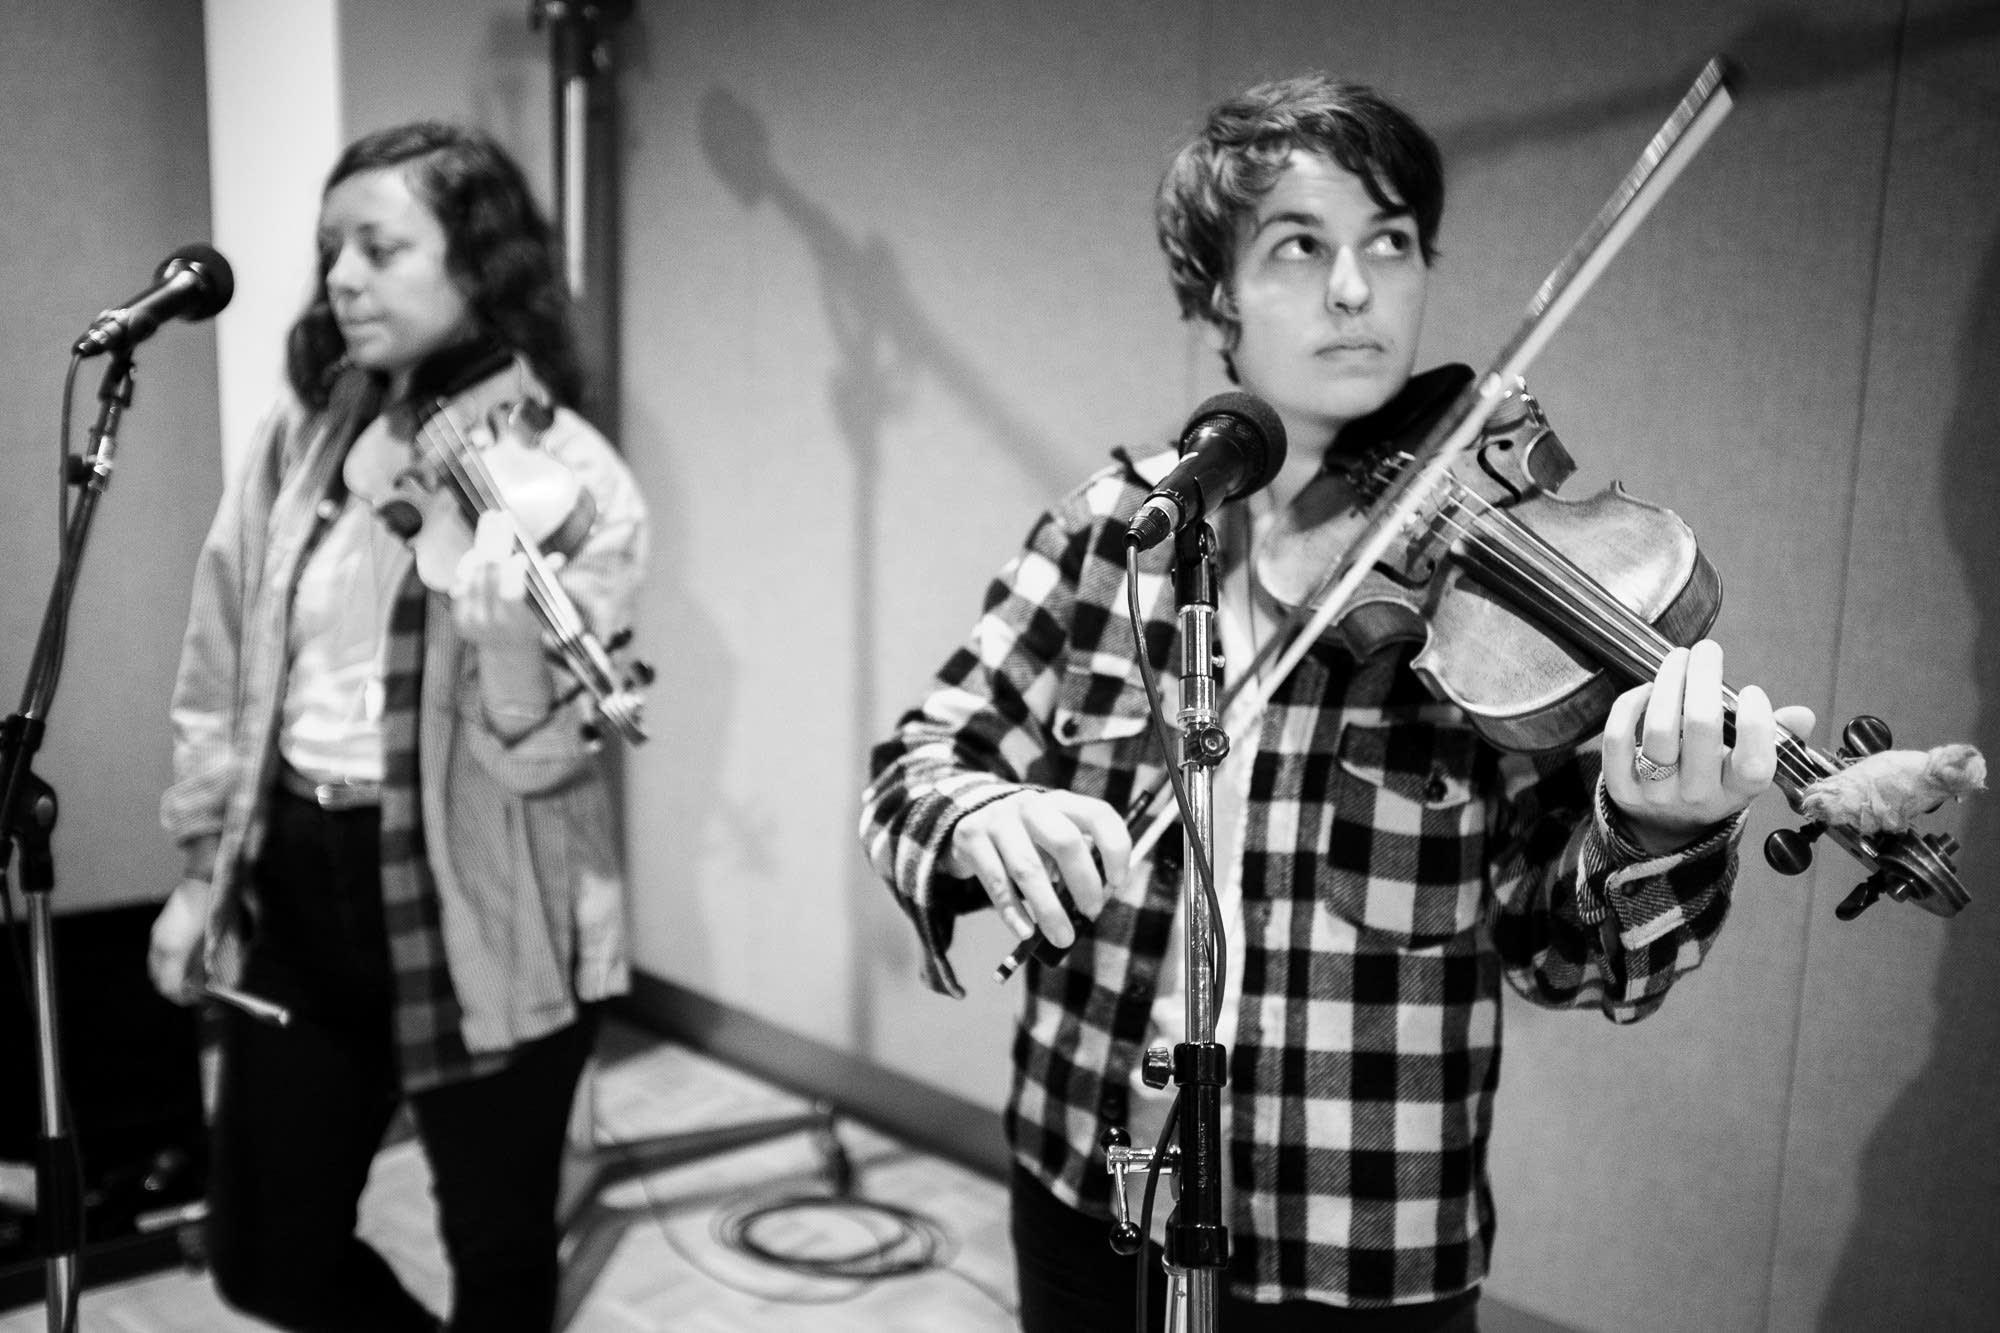 typhoon, violin players